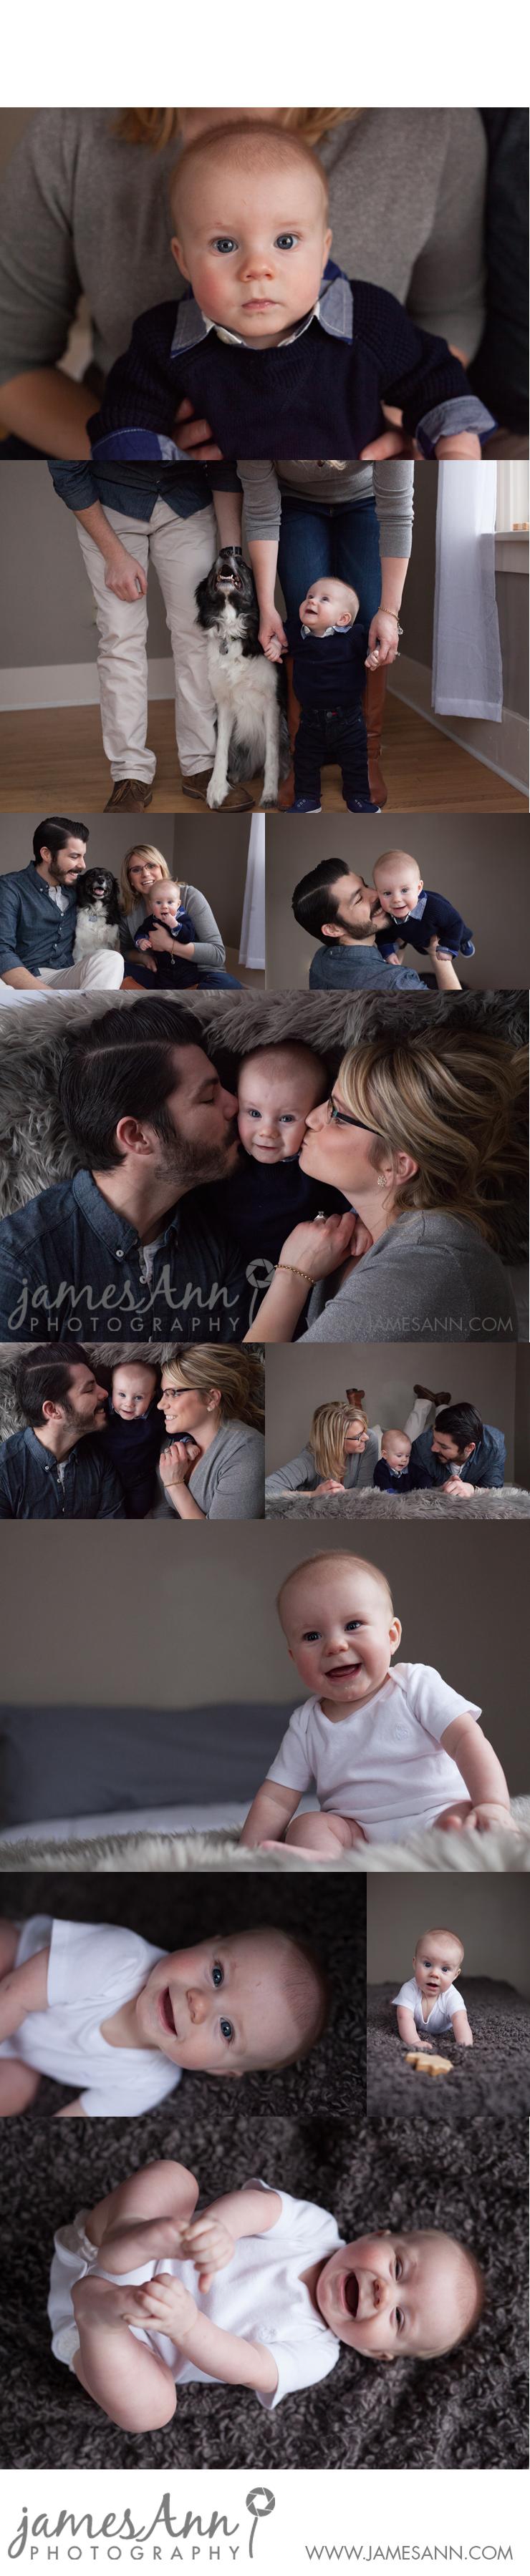 Baby Oliver, Children's Photography, Lincoln, NE ...